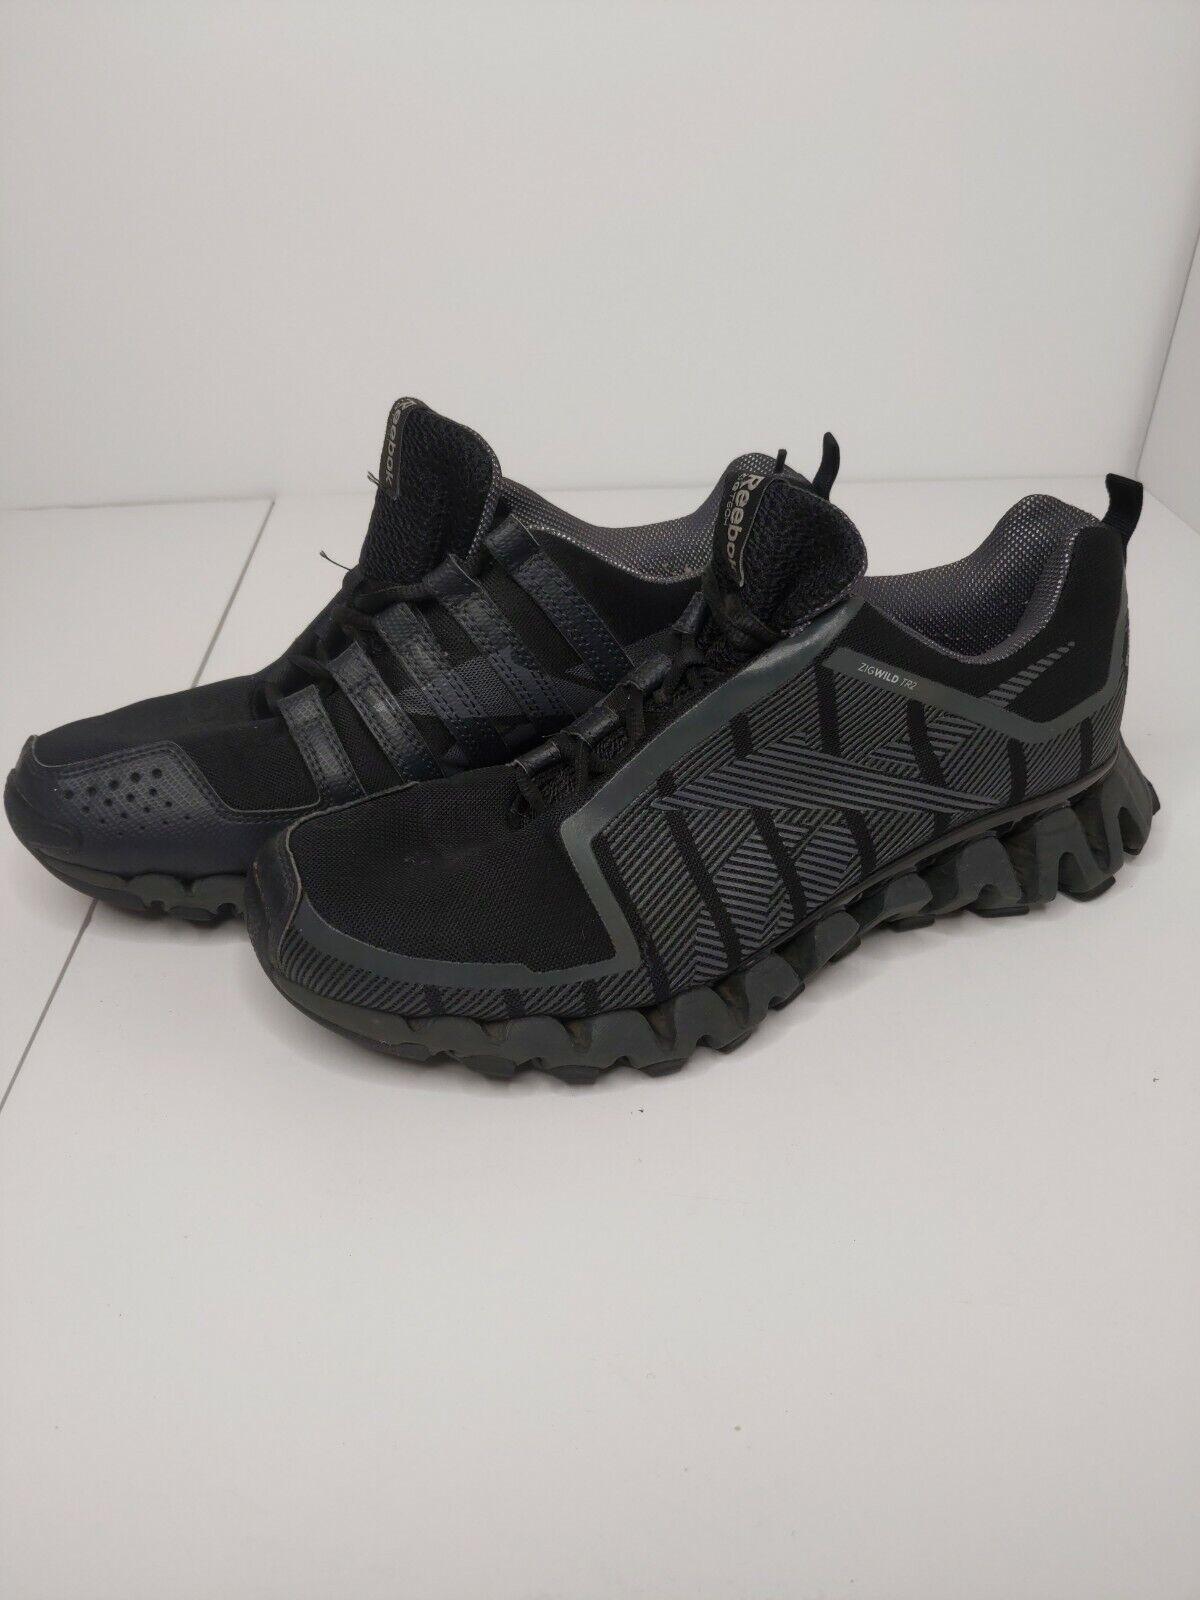 Reebok Zigwild TR 2 Mens Size 8 Black